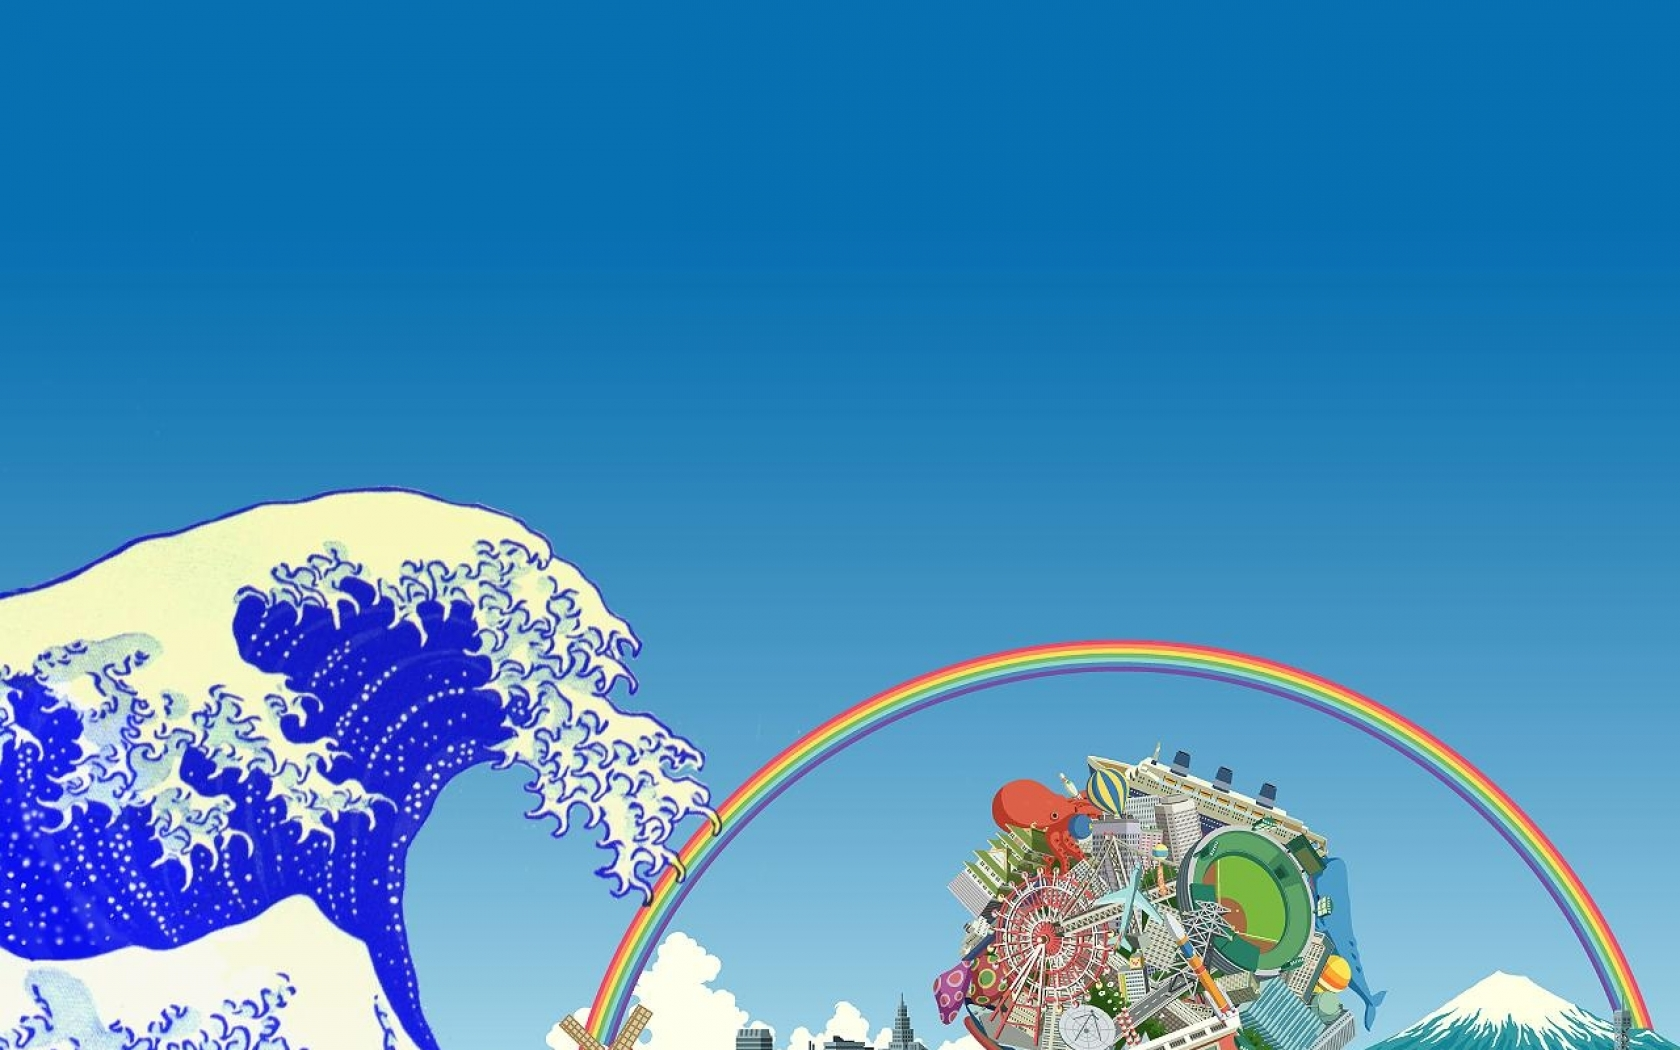 katamari damacy the great wave off kanagawa 1280x1024 wallpaper Art HD 1680x1050